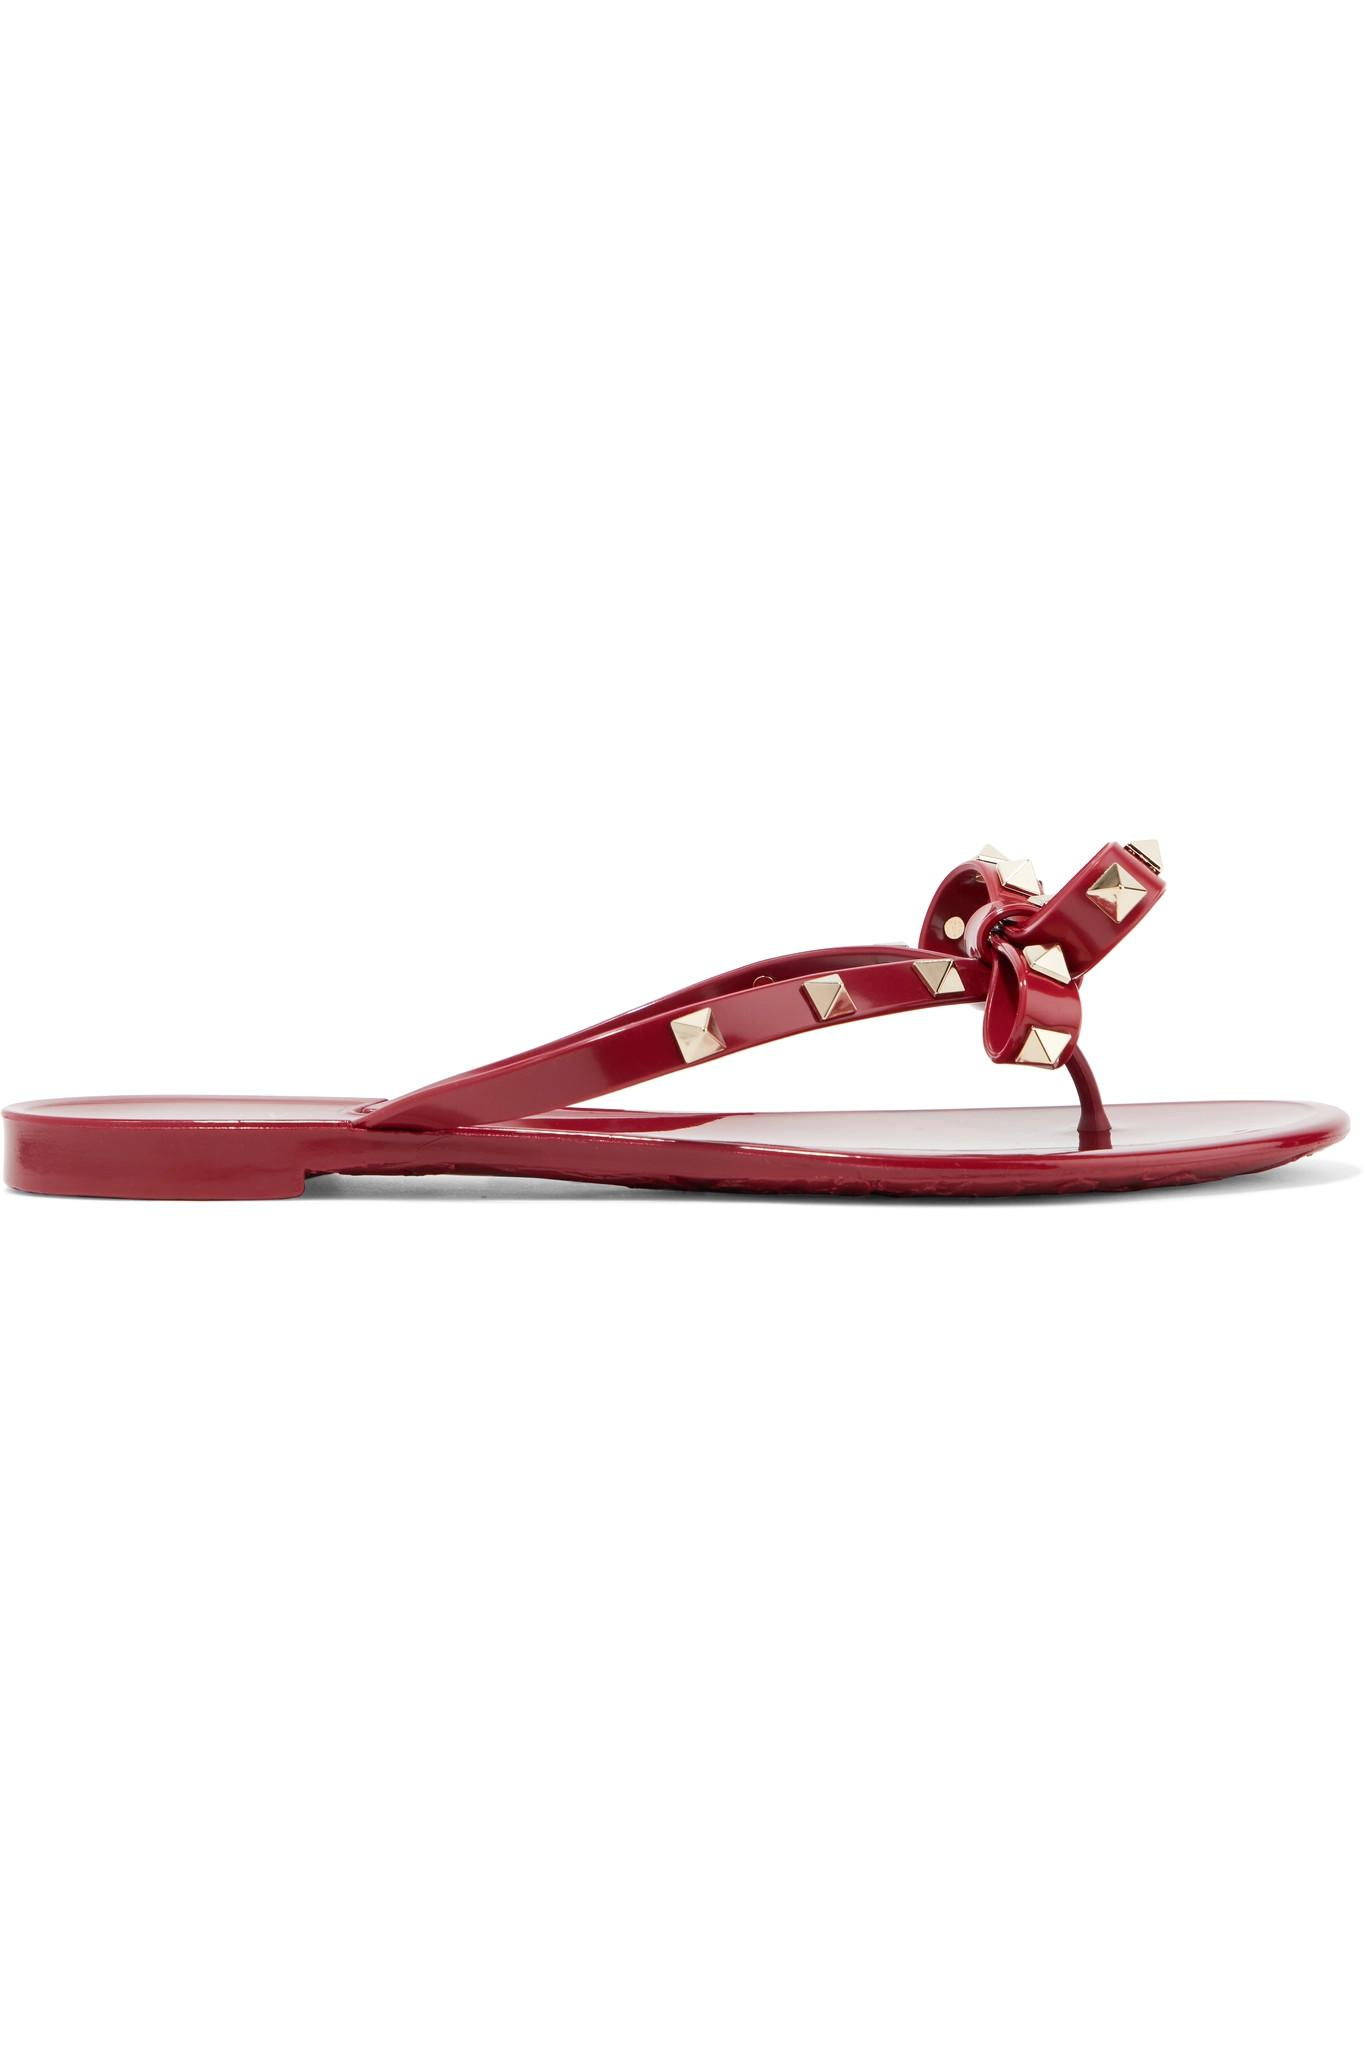 30c940bf790 Lyst - Tongs En Caoutchouc Rockstud Garavani Valentino en coloris Rouge